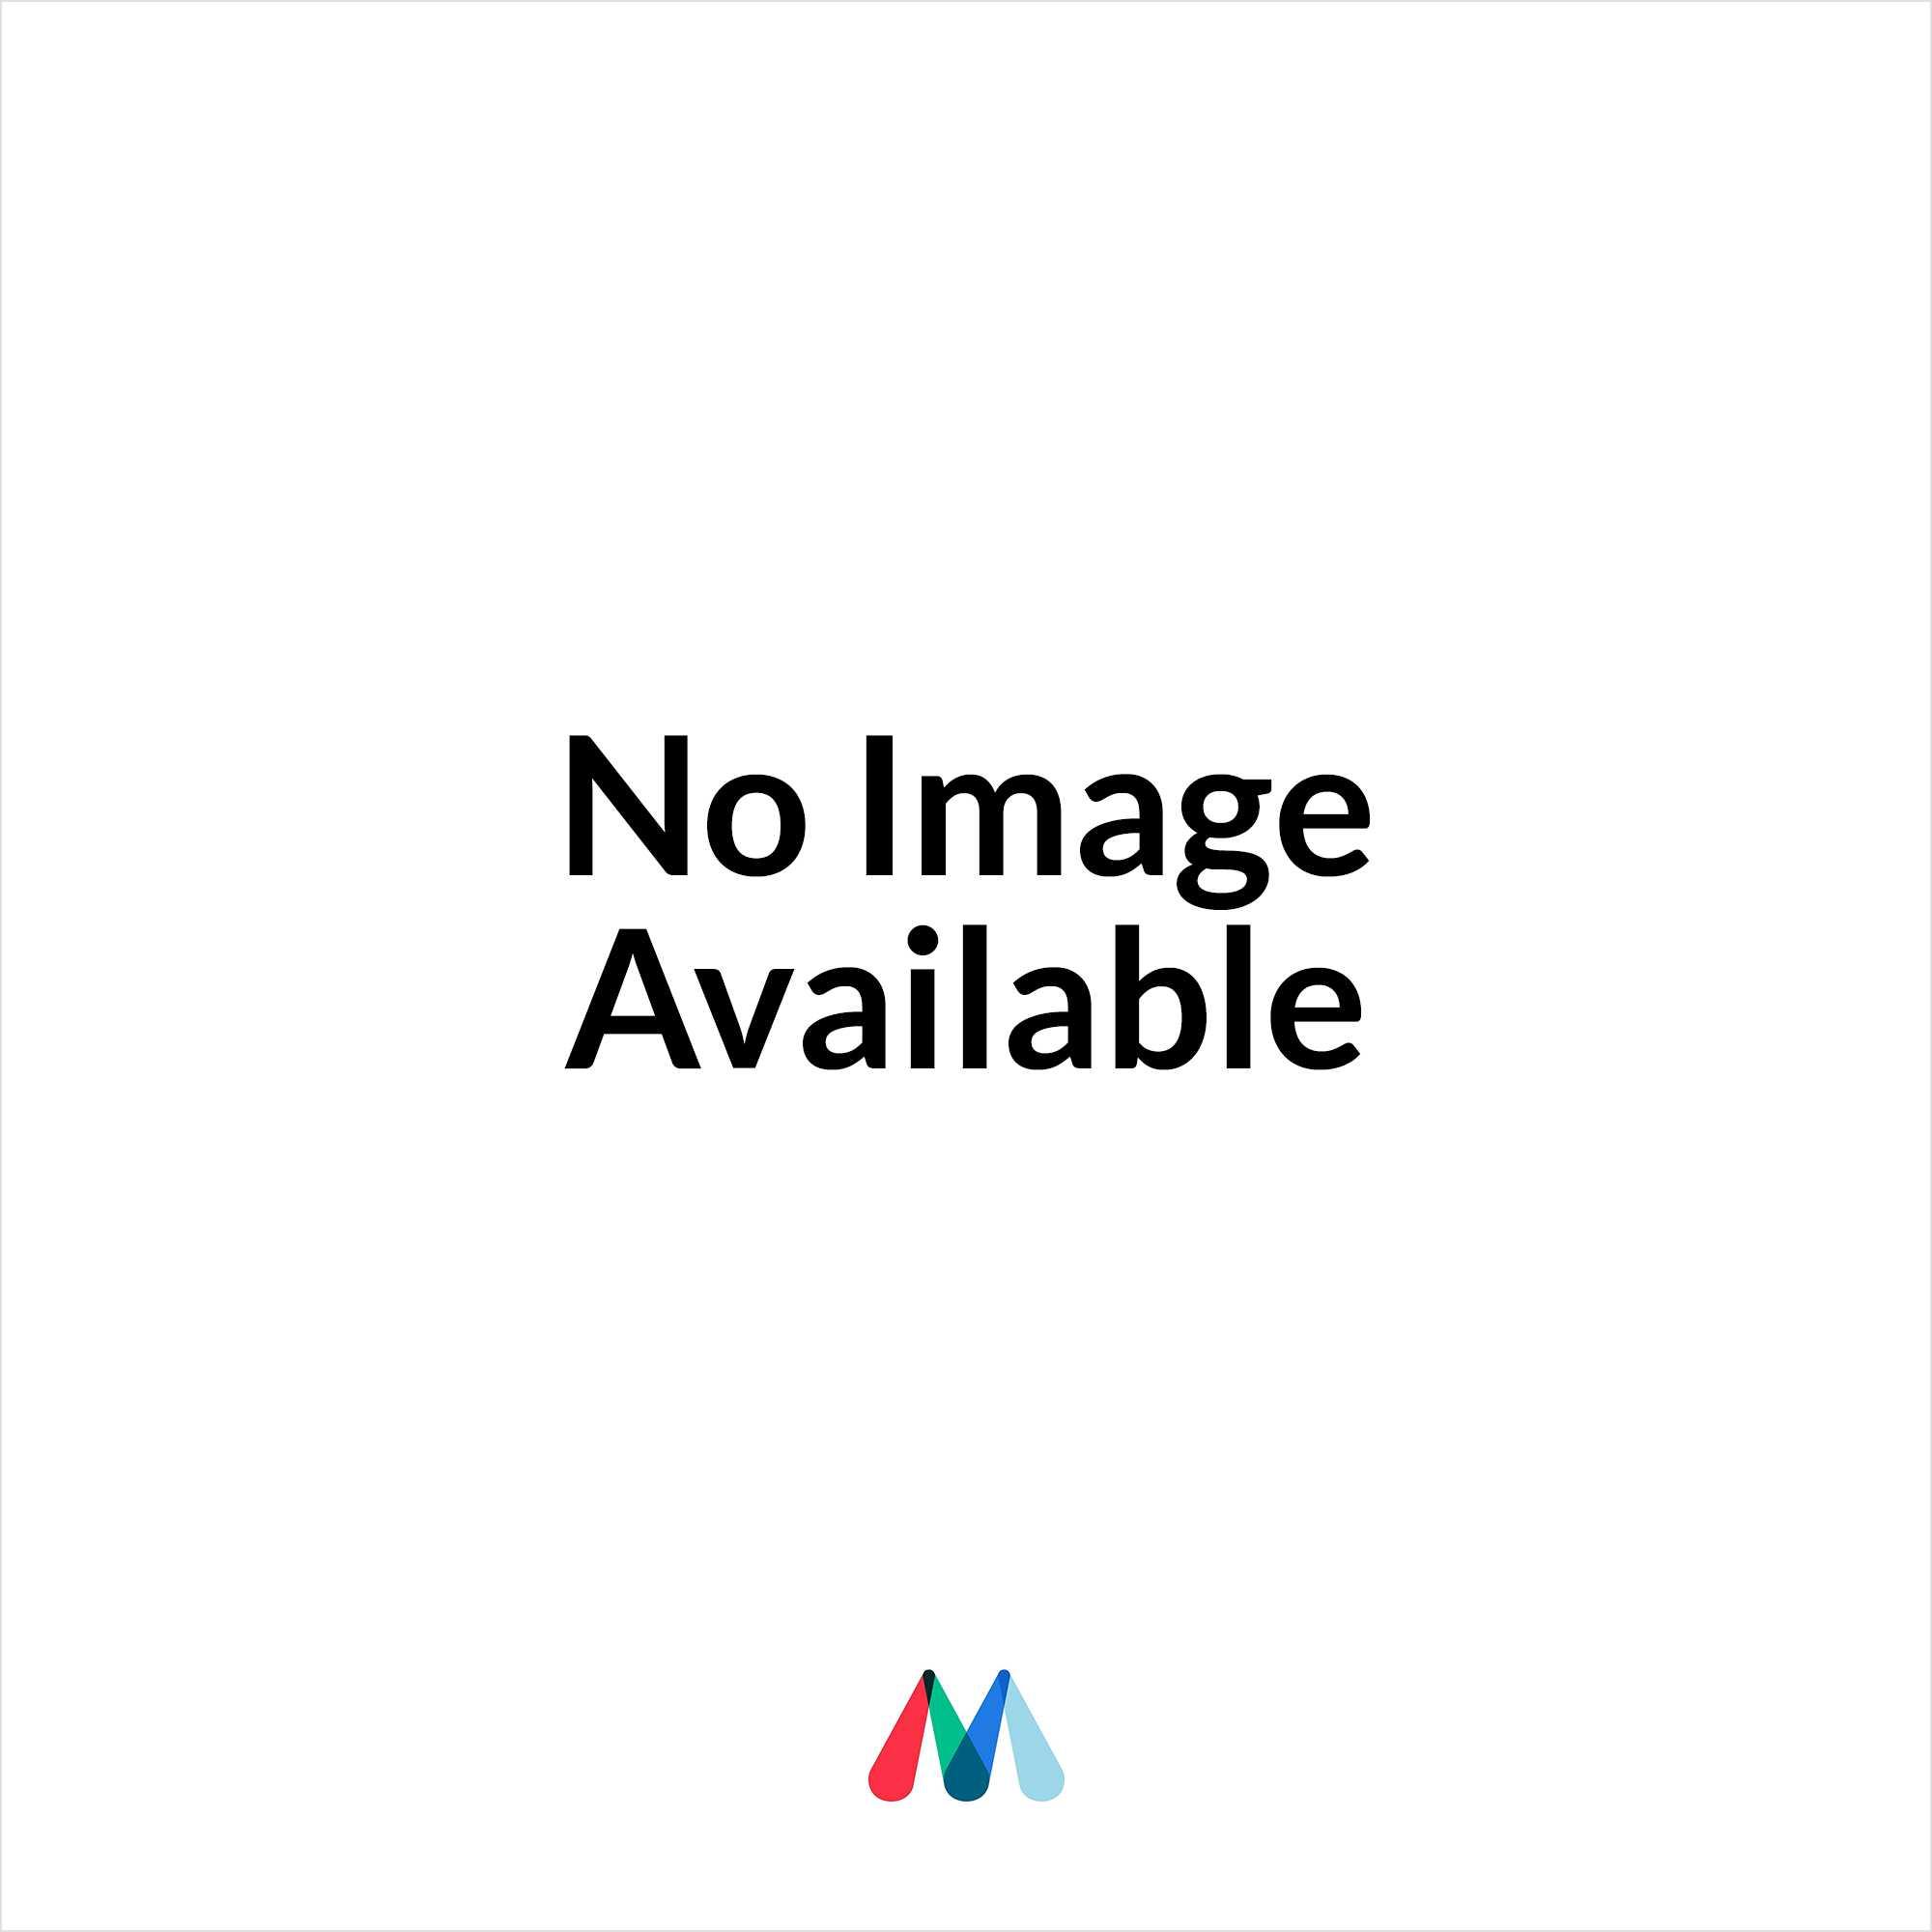 Collingwood lighting mc025 s straight to mains updown mini led cube mc025 s straight to mains updown mini led cube wall light aluminium aloadofball Choice Image